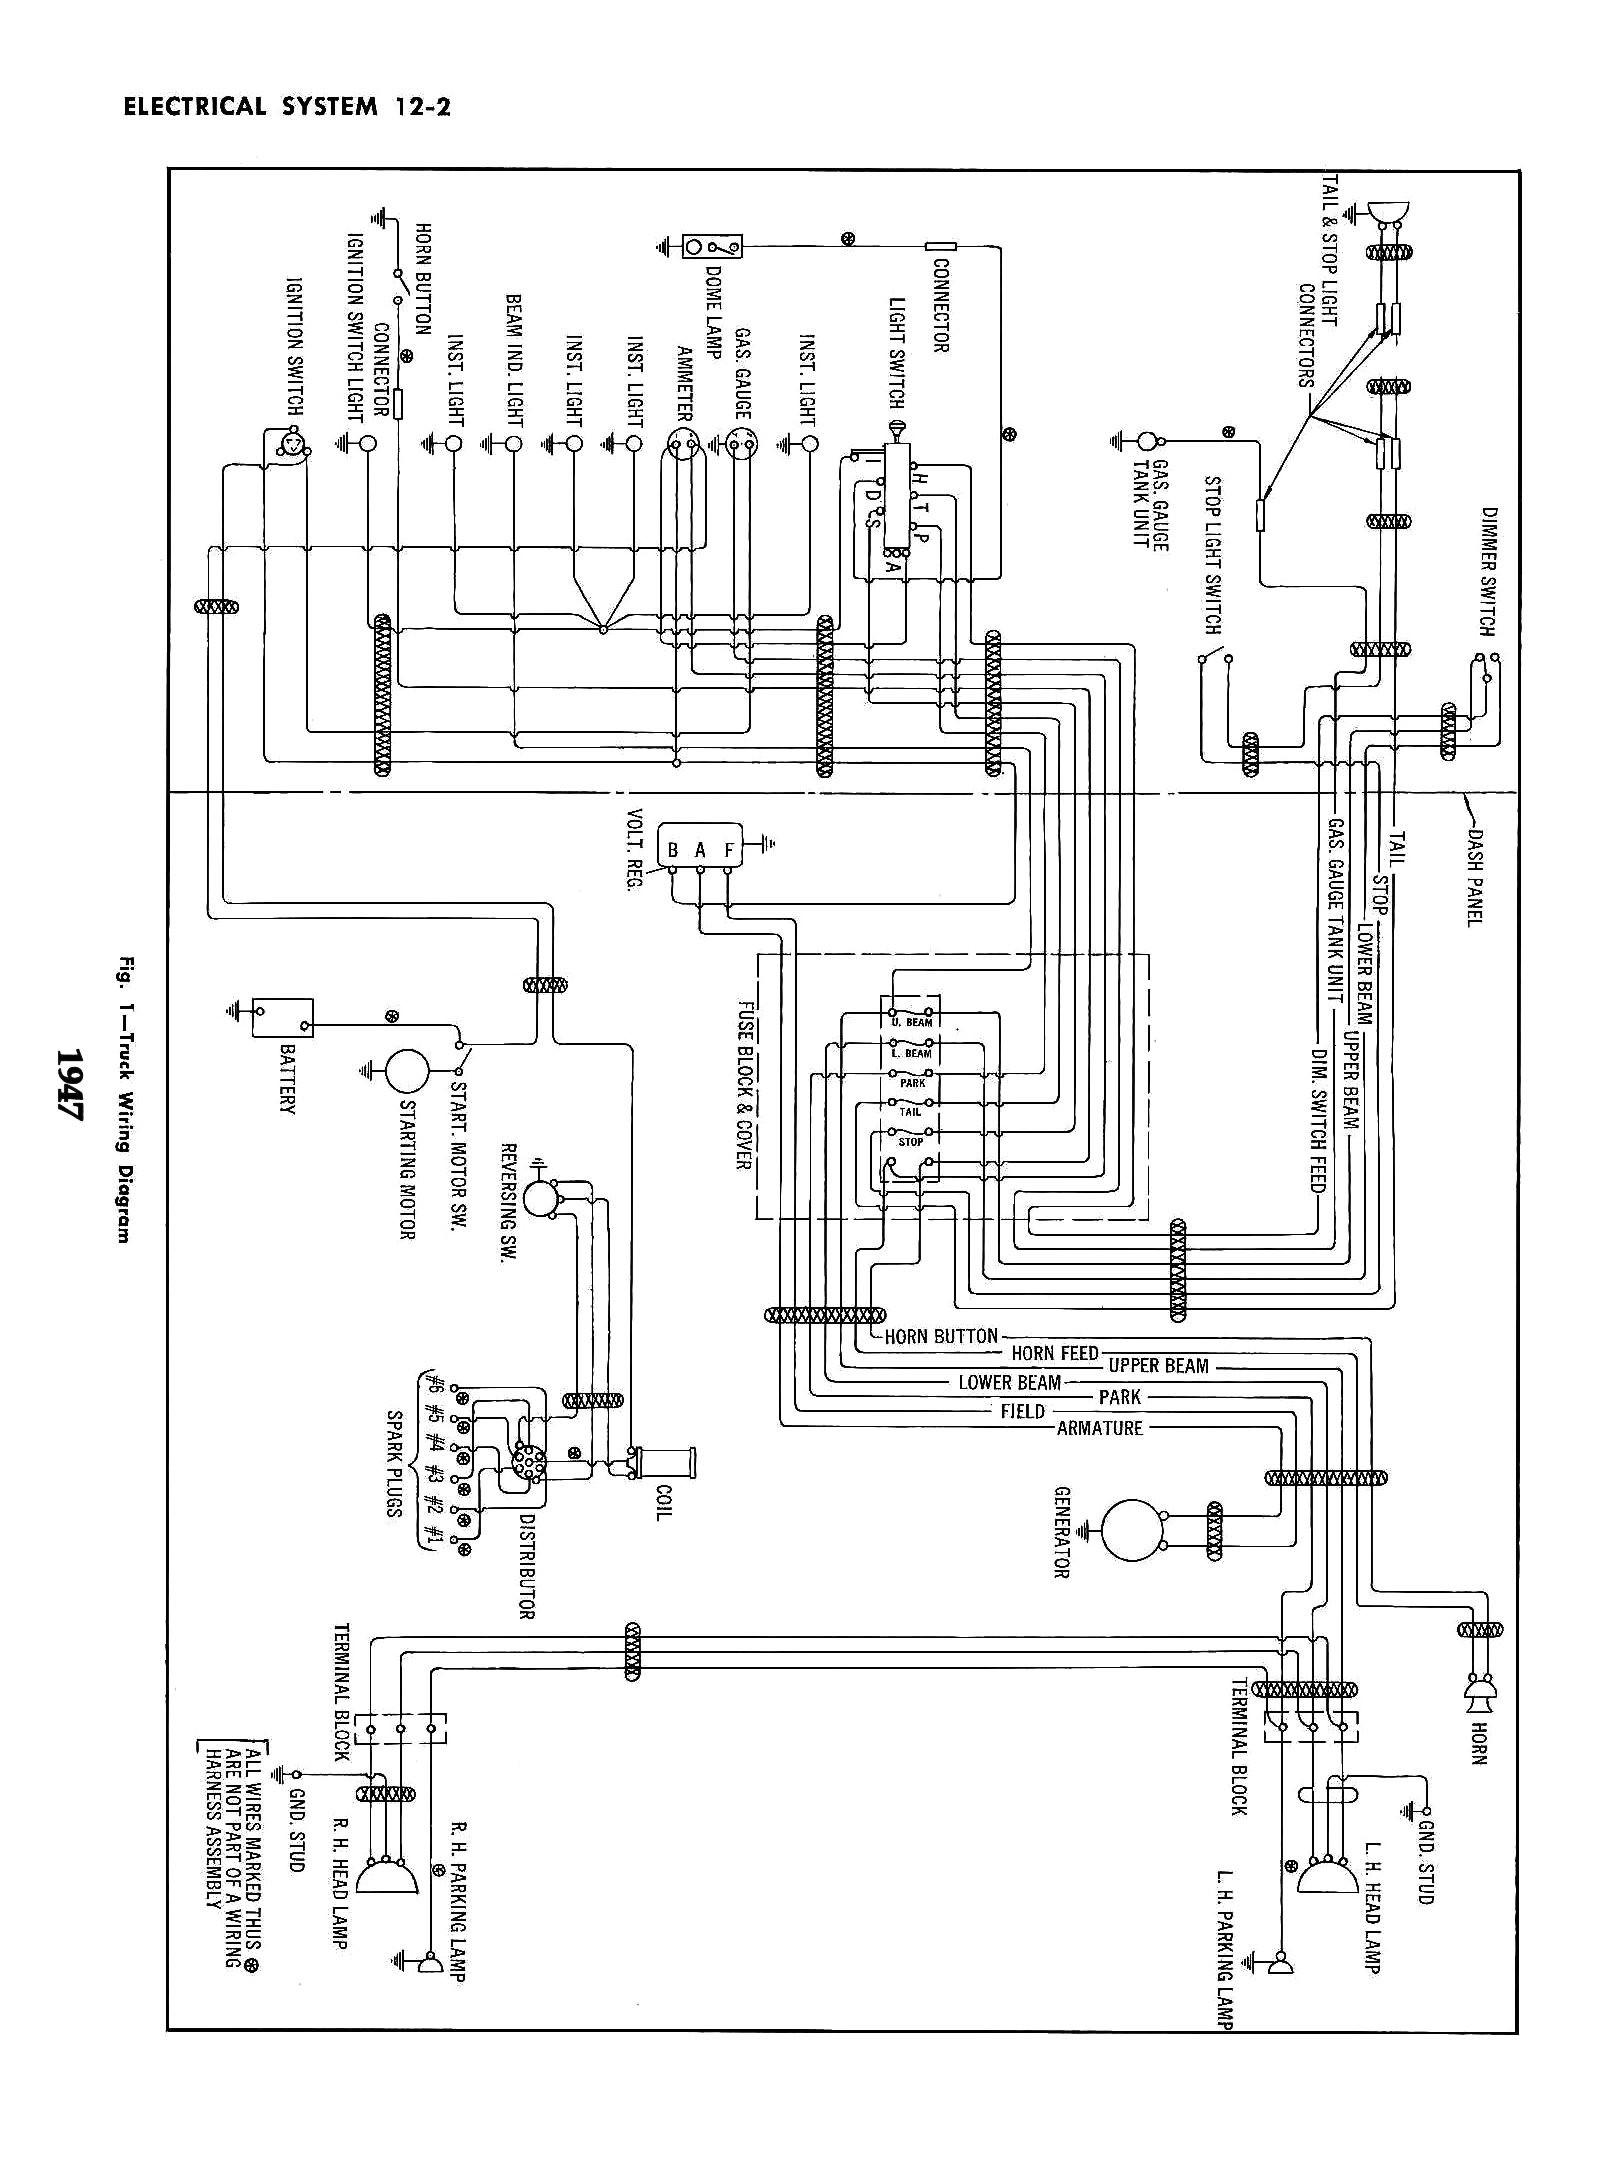 universal headlight switch wiring diagram